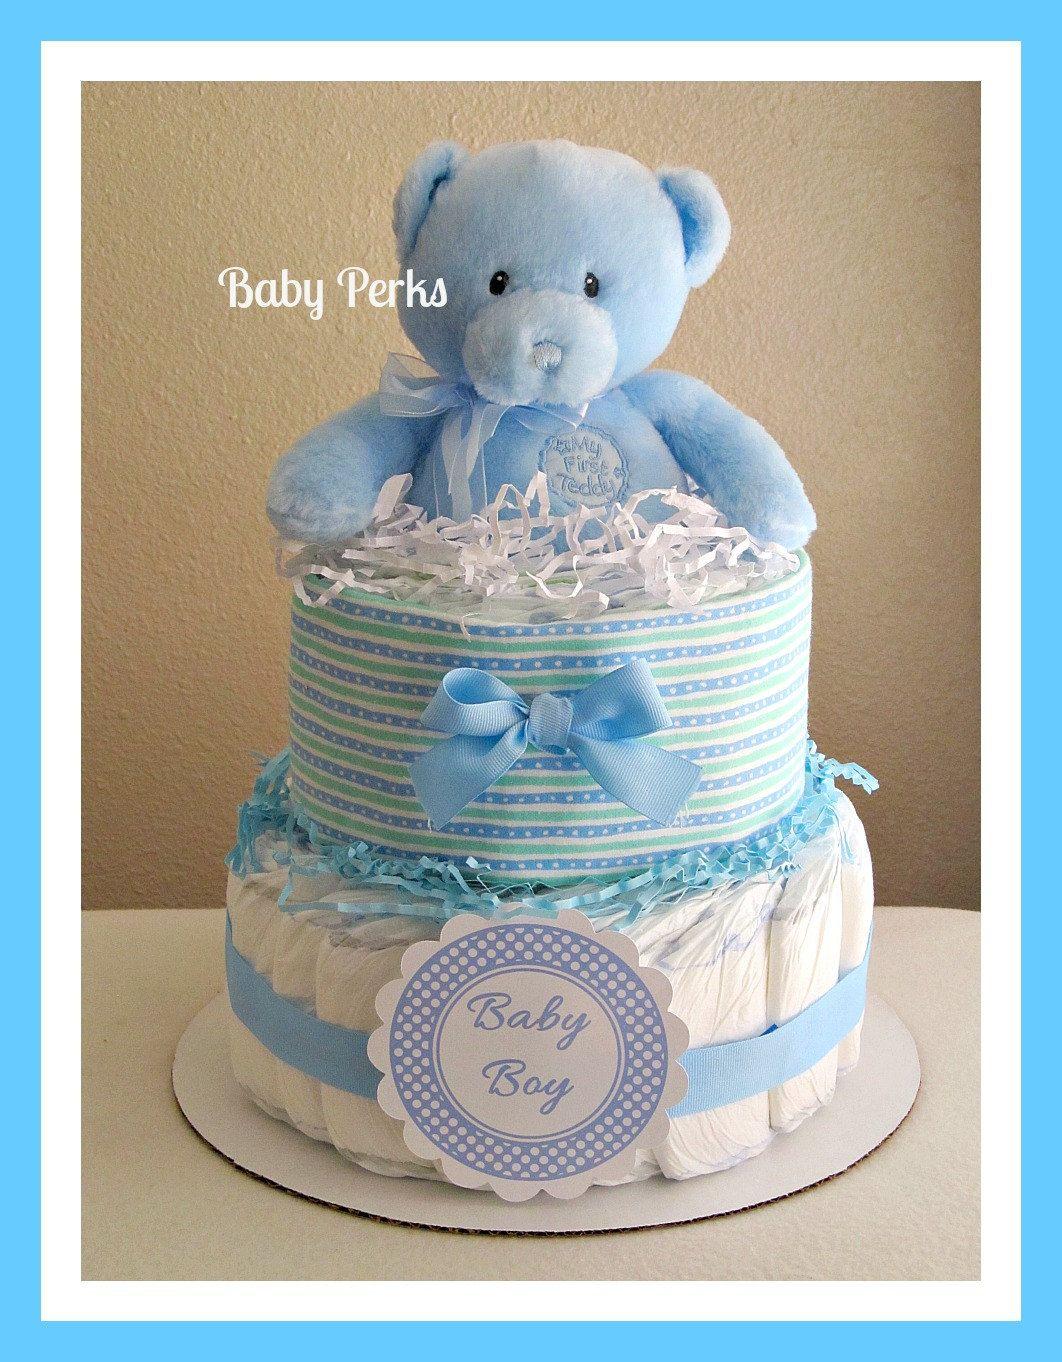 Baby Boy Diaper Cakes Baby Boy Diaper Cake By Msperks On Etsy Baby Diaper Cake Boy Baby Diaper Cake Diaper Cake Boy